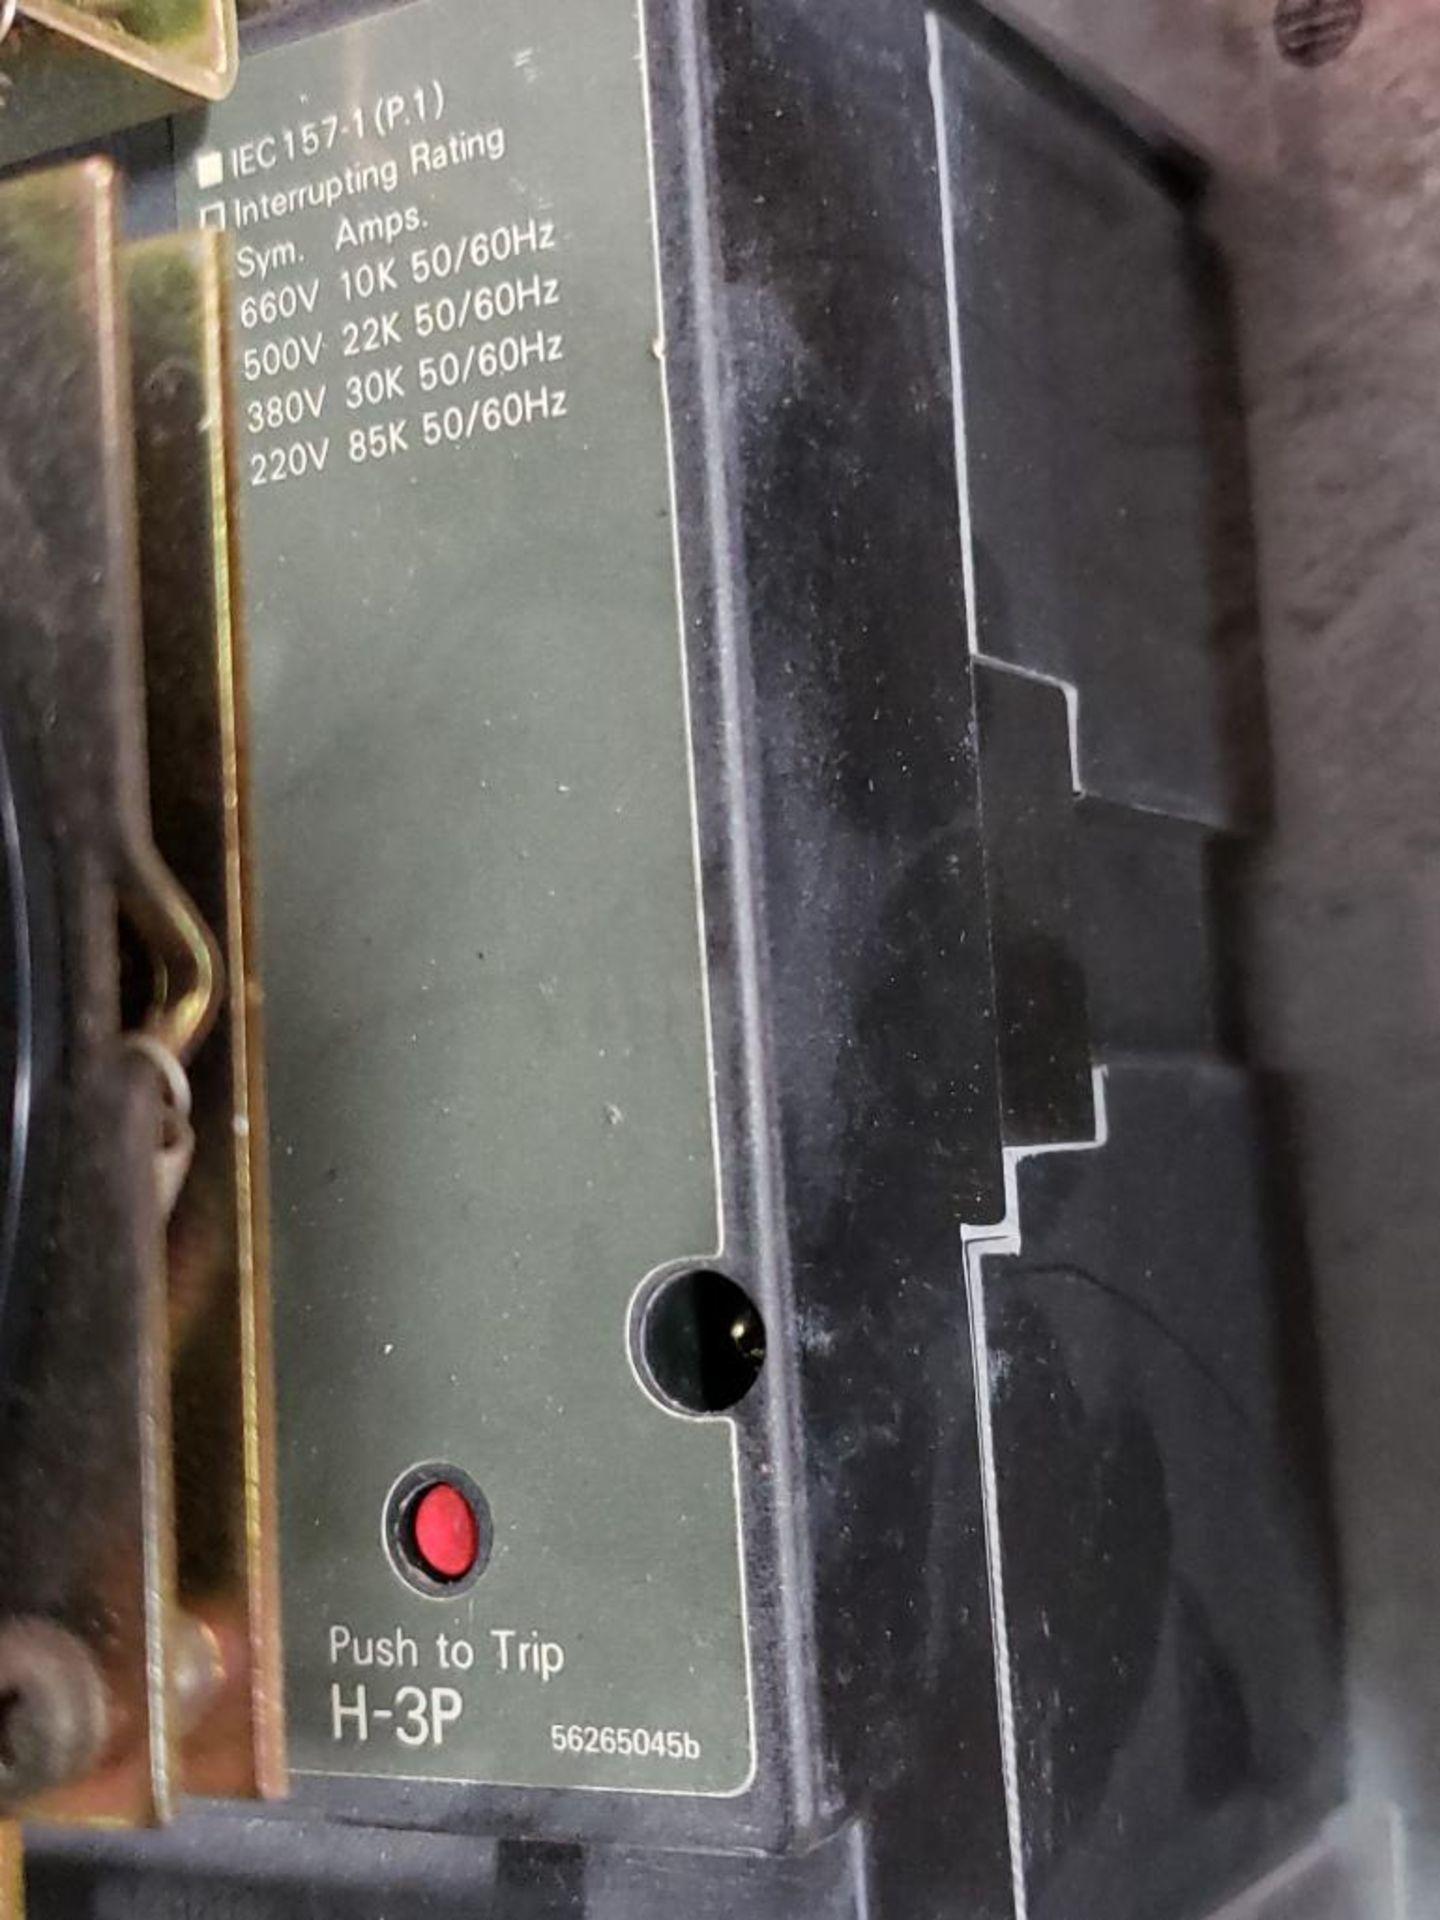 Fuji BU-FHB3020 Circuit Breaker safety switch. - Image 3 of 3